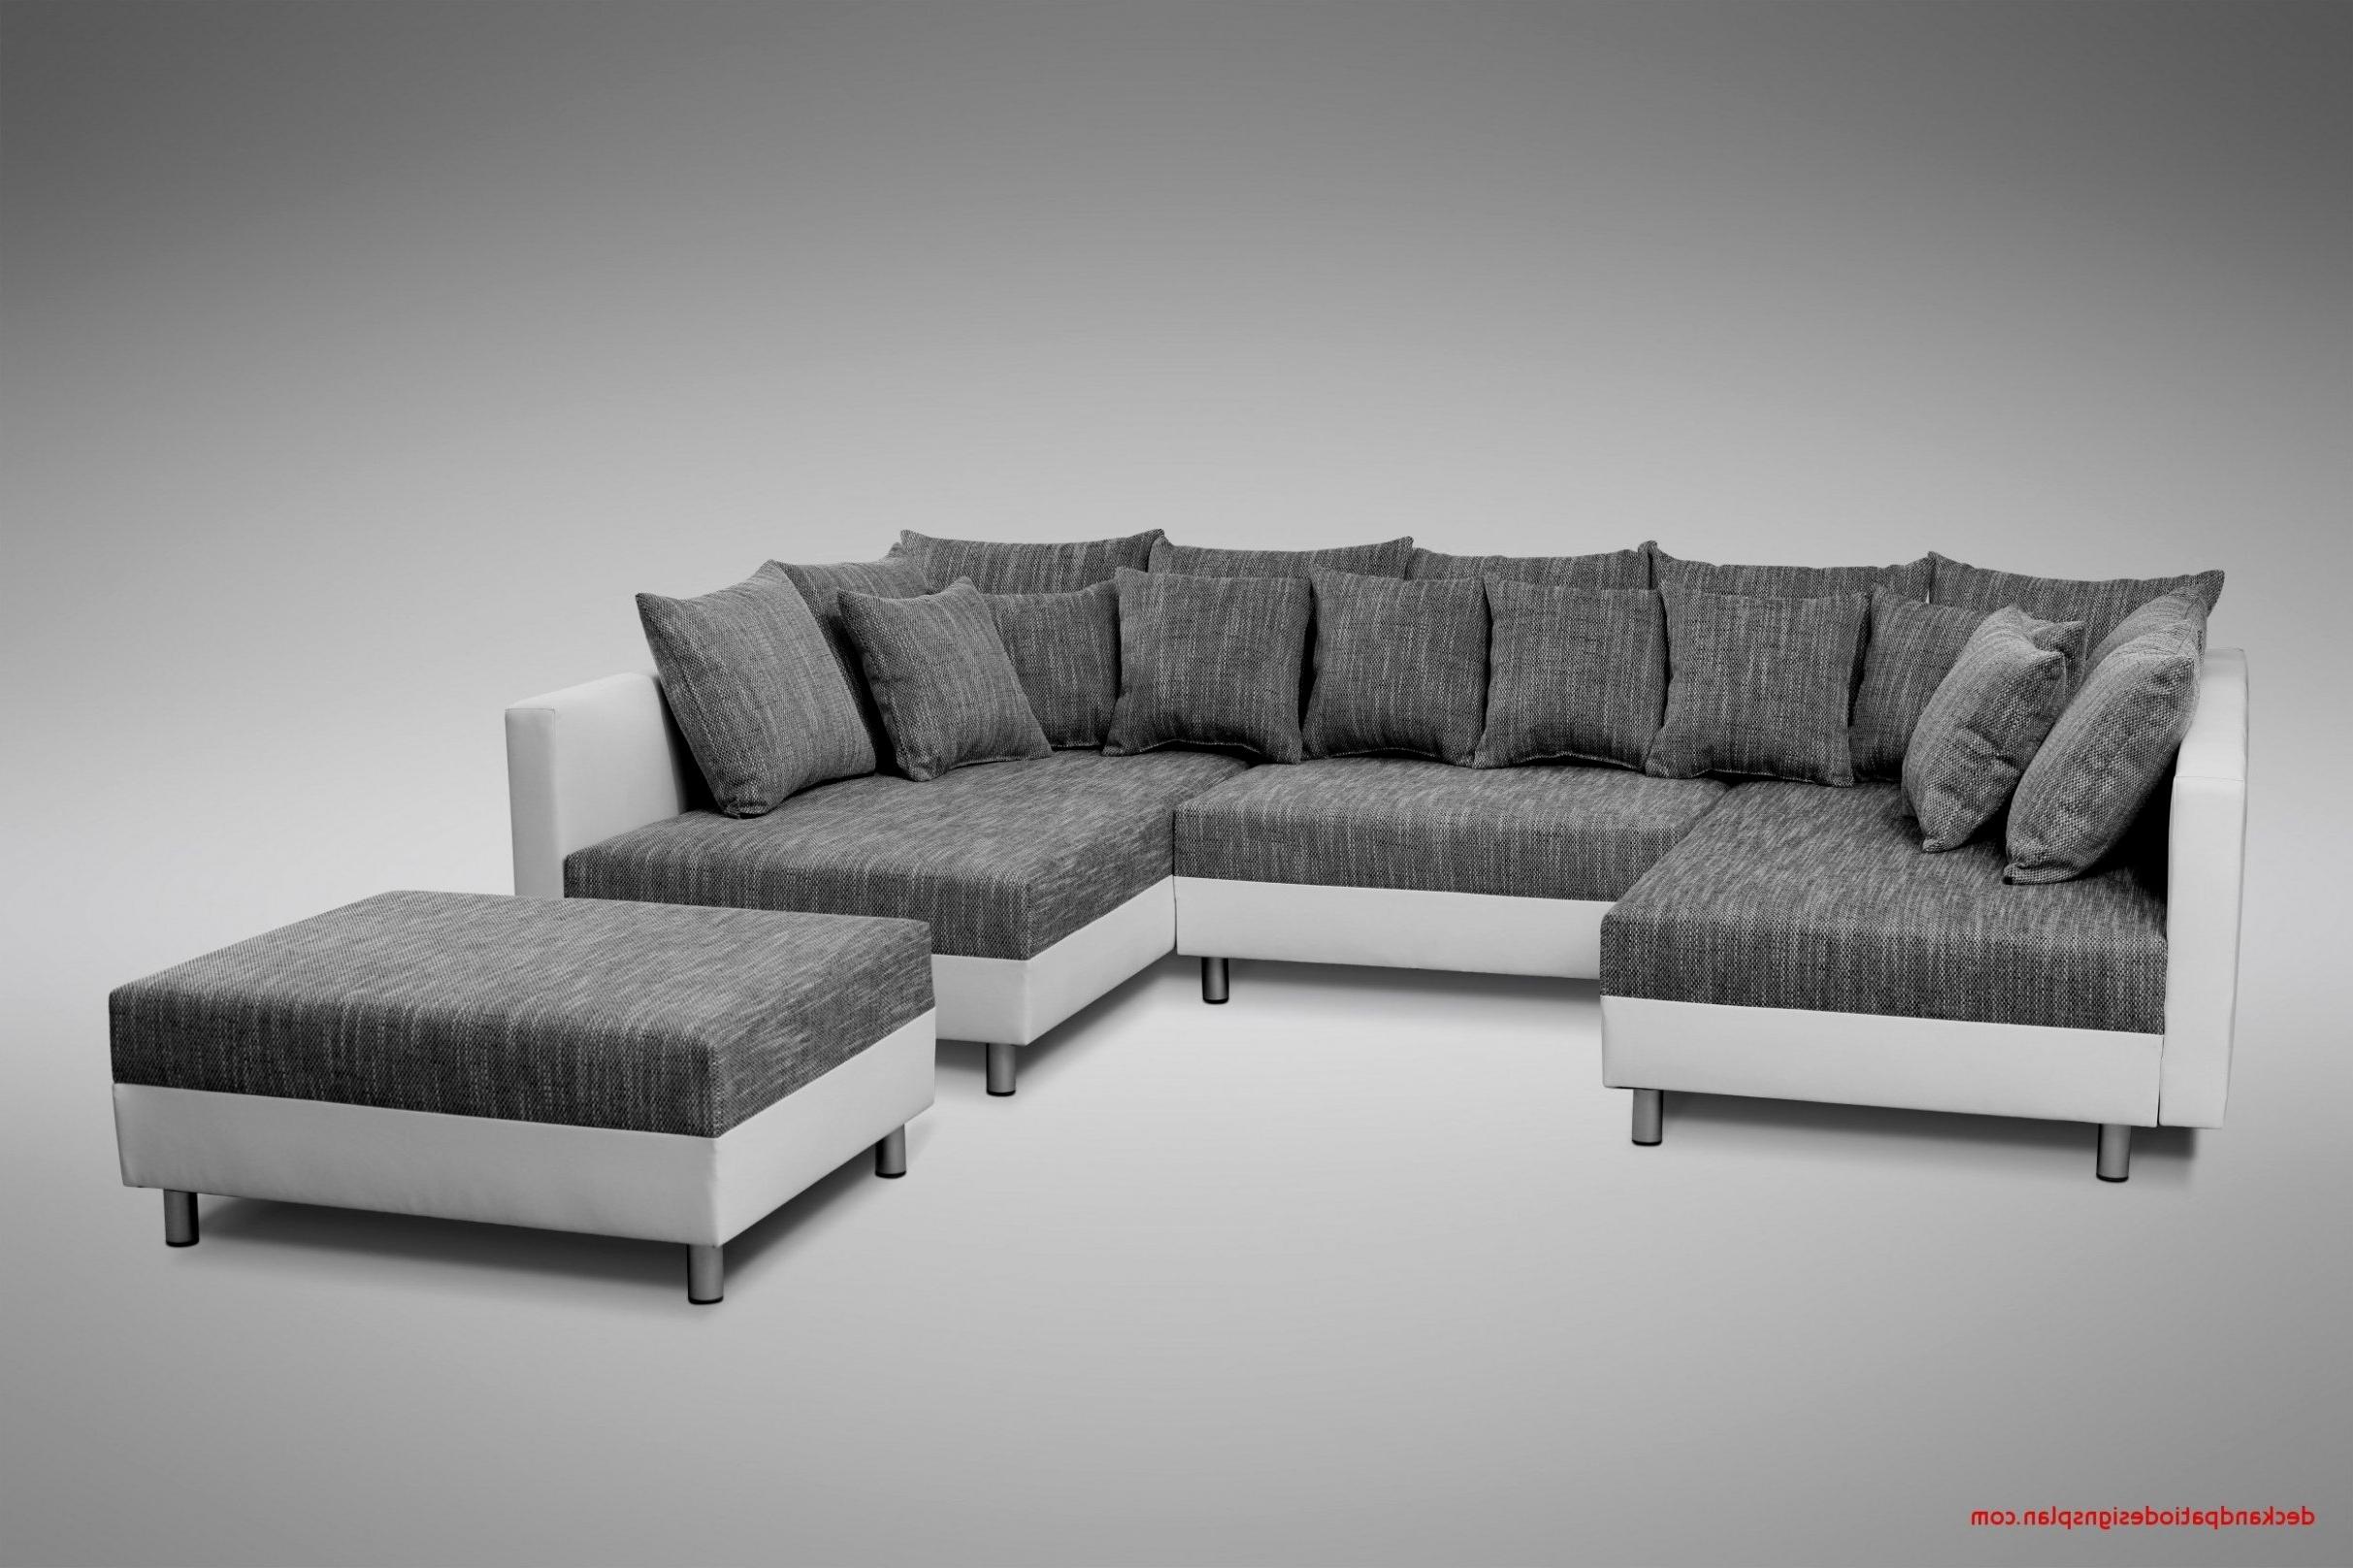 Sofa Relax Ikea 9ddf Conforama sofas Relax Famoso Chaise De Salon Ikea Modeste Big sofa